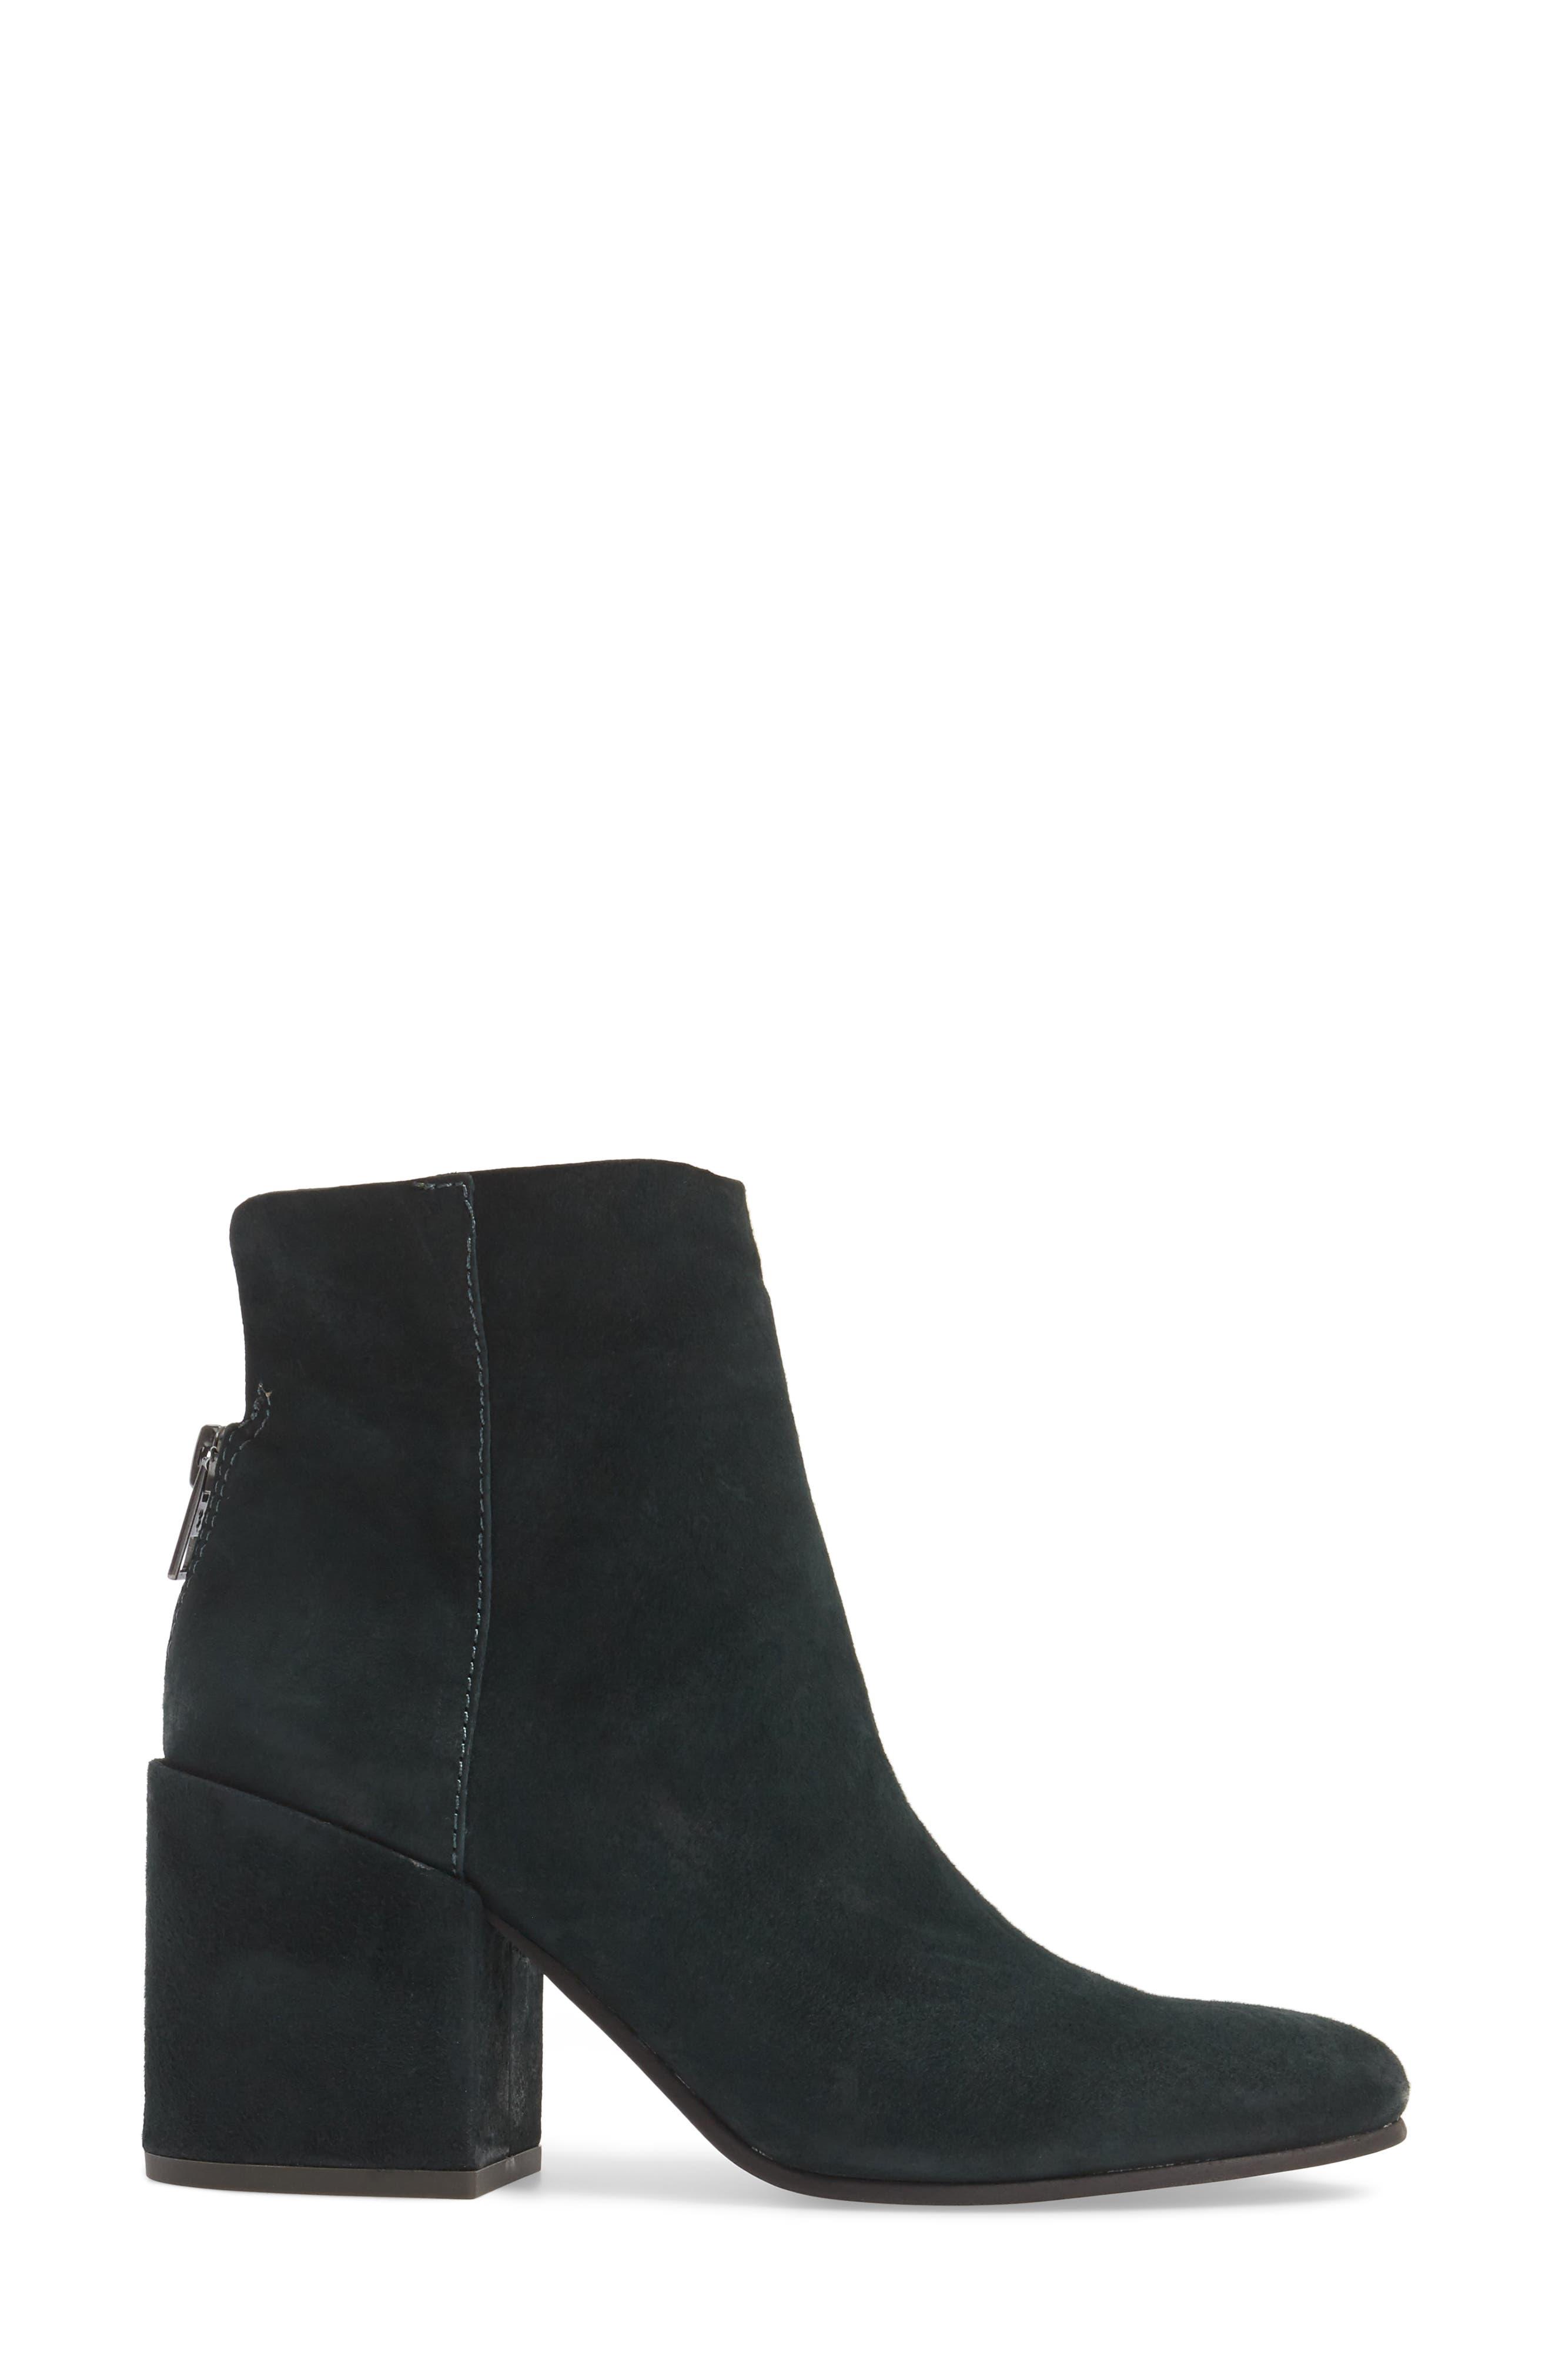 Ravynn Block Heel Bootie,                             Alternate thumbnail 3, color,                             Dark Cyan Leather